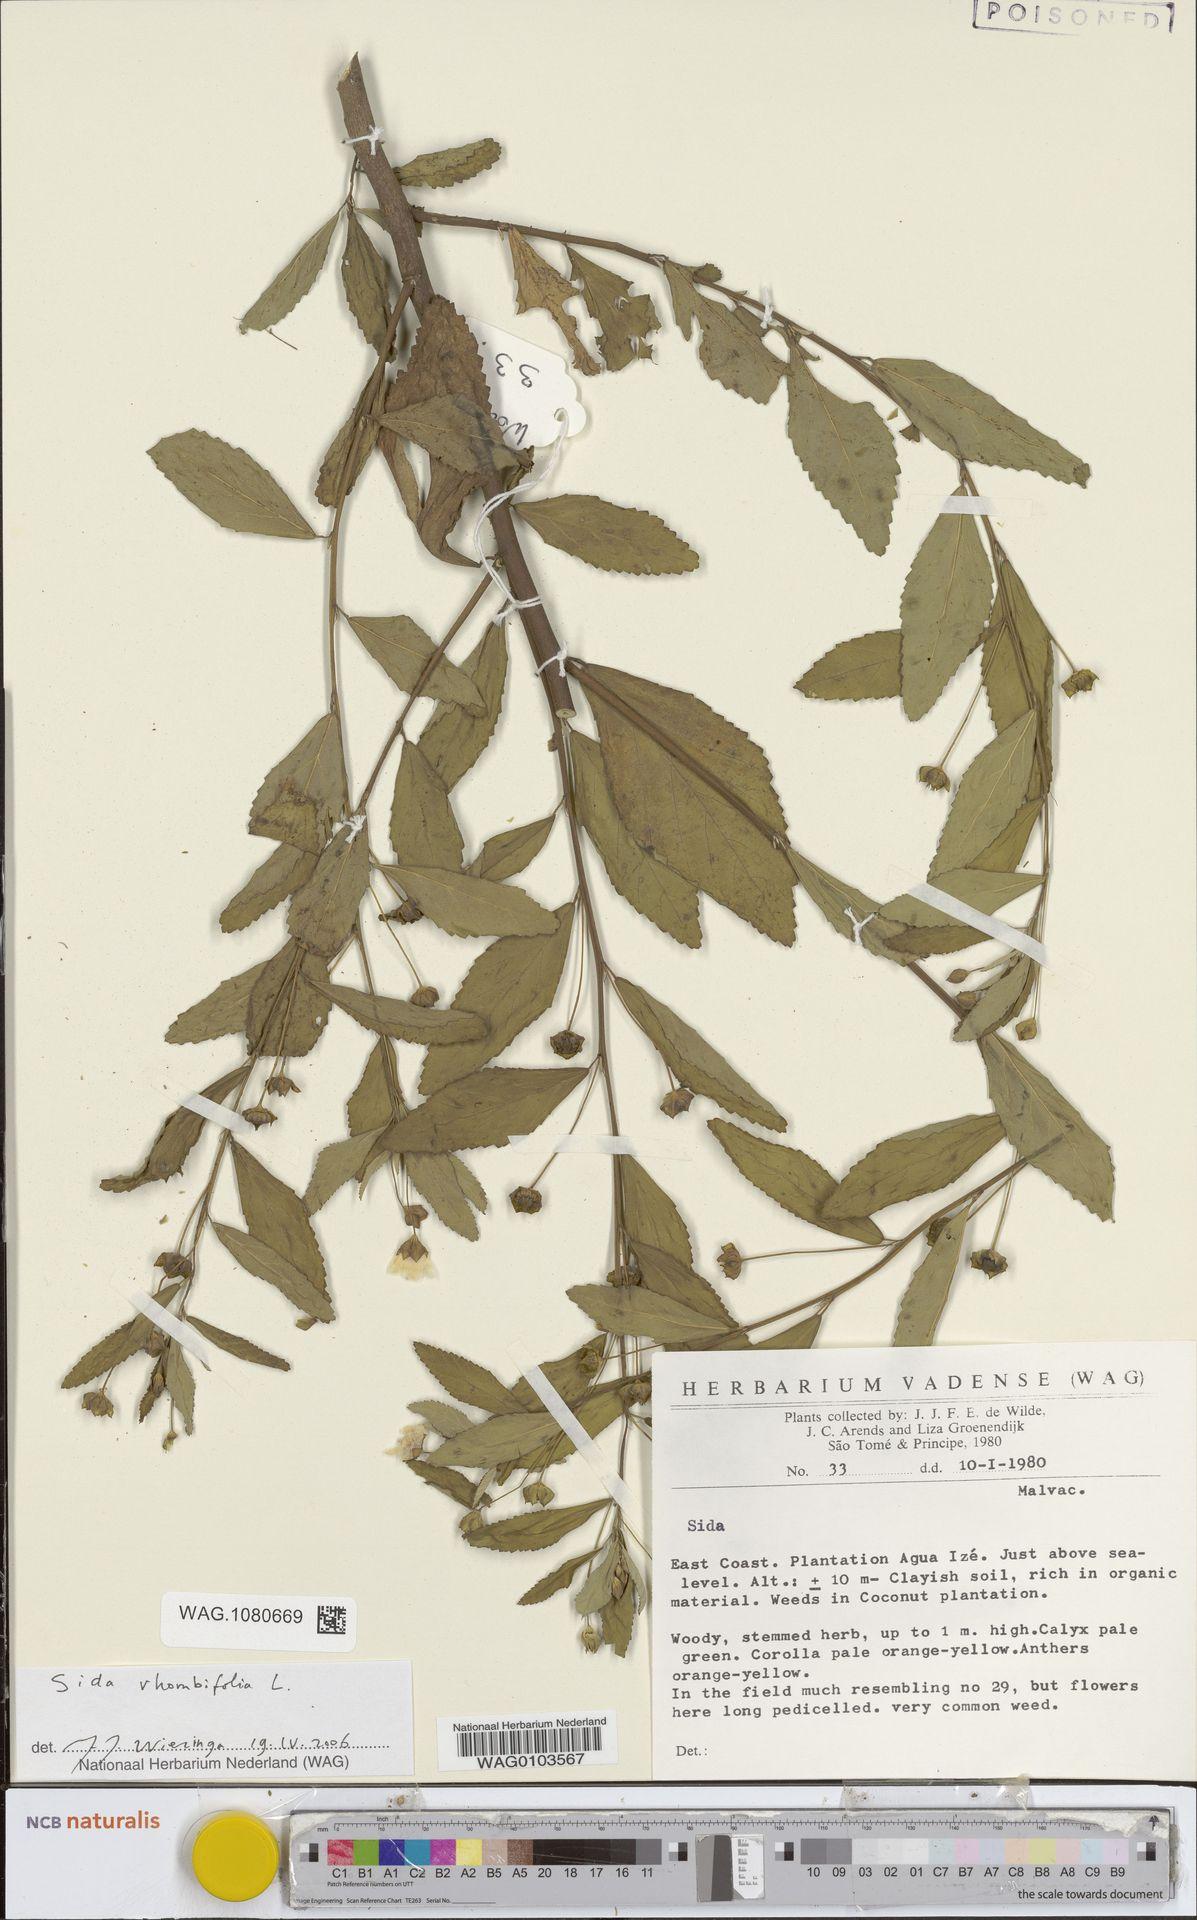 WAG.1080669 | Sida rhombifolia L.